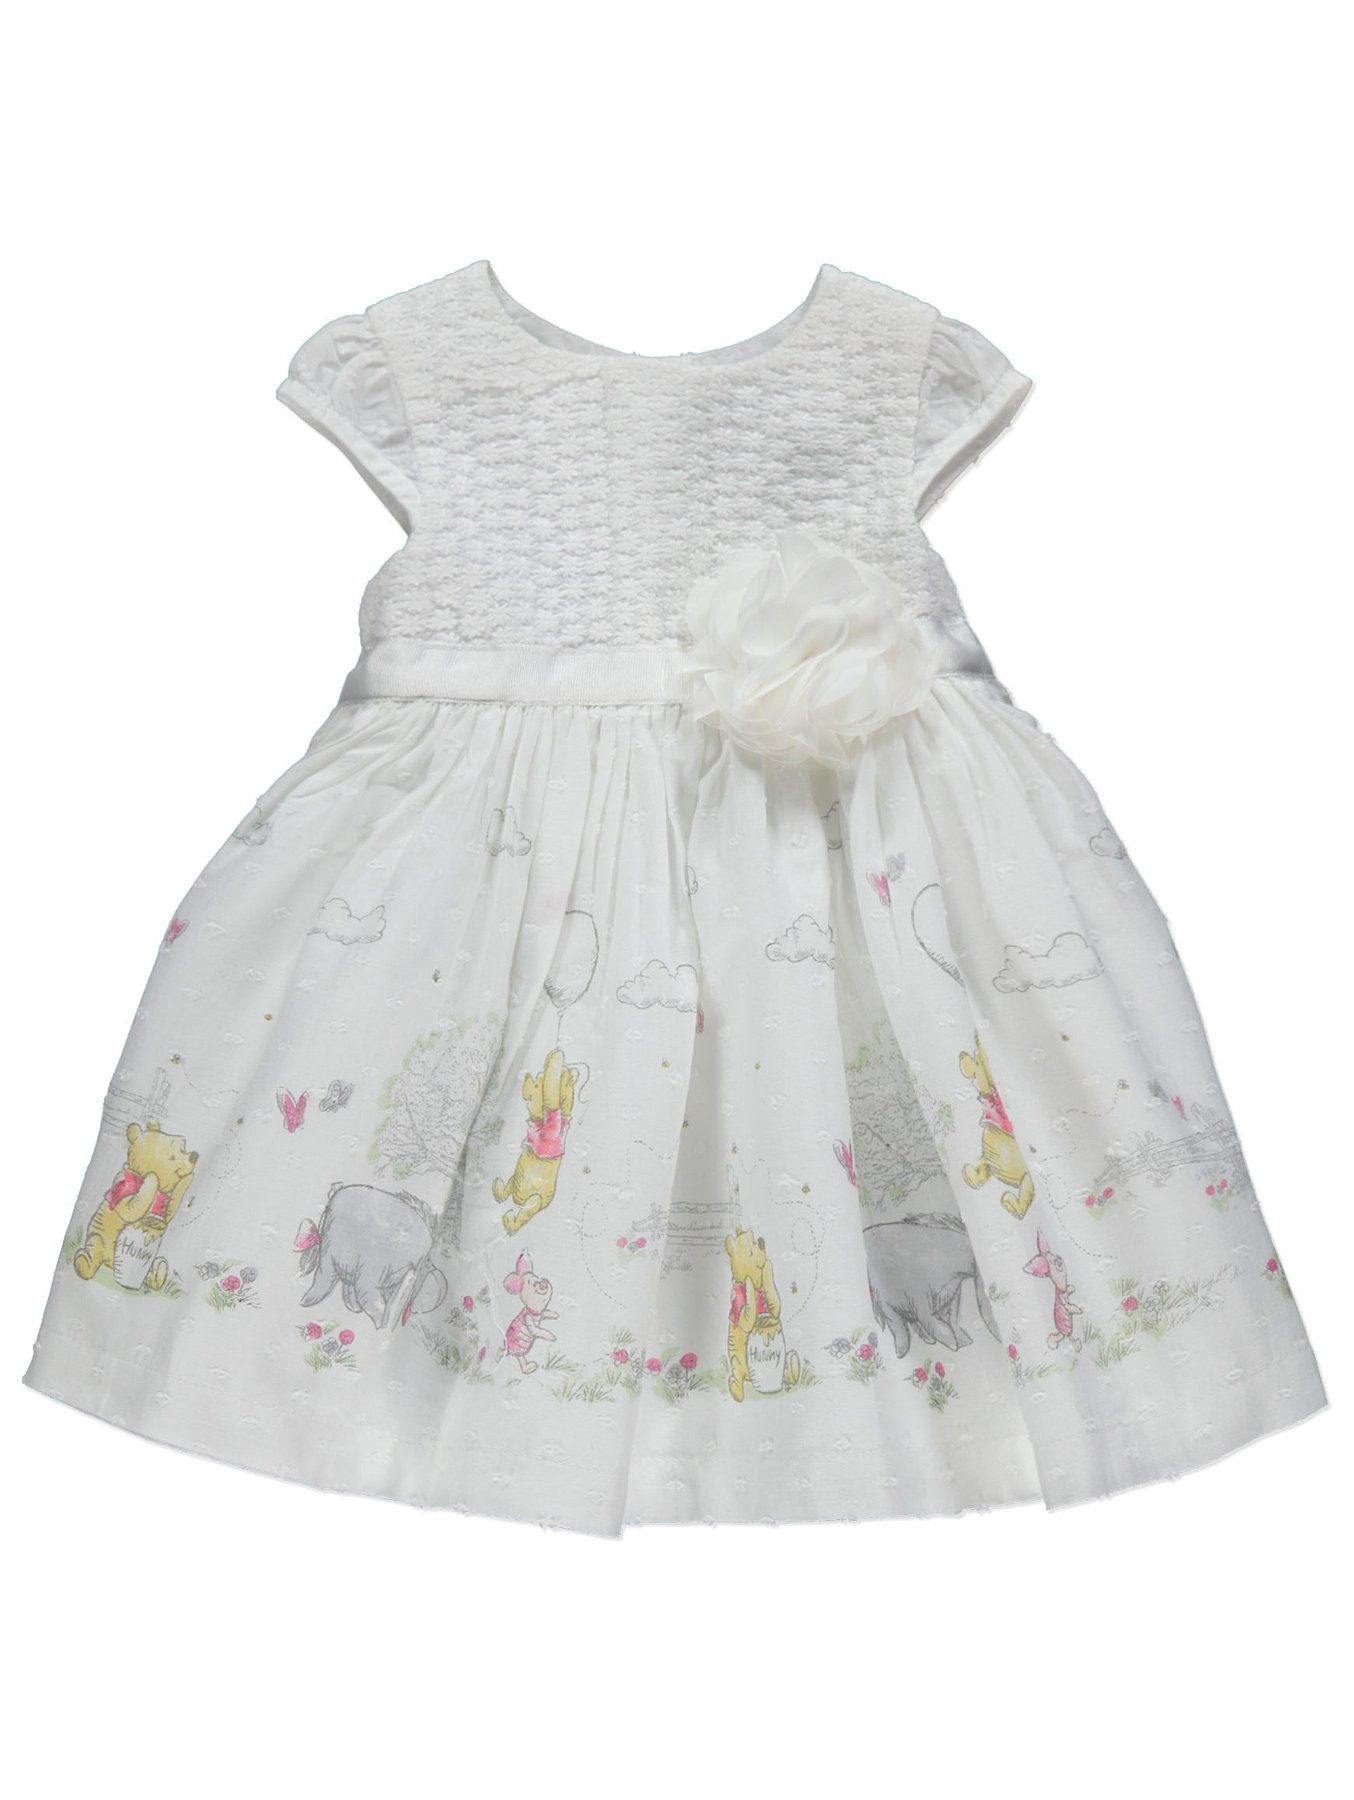 bcd5bf275 Disney Winnie the Pooh White Flower Detail Dress | Baby | George